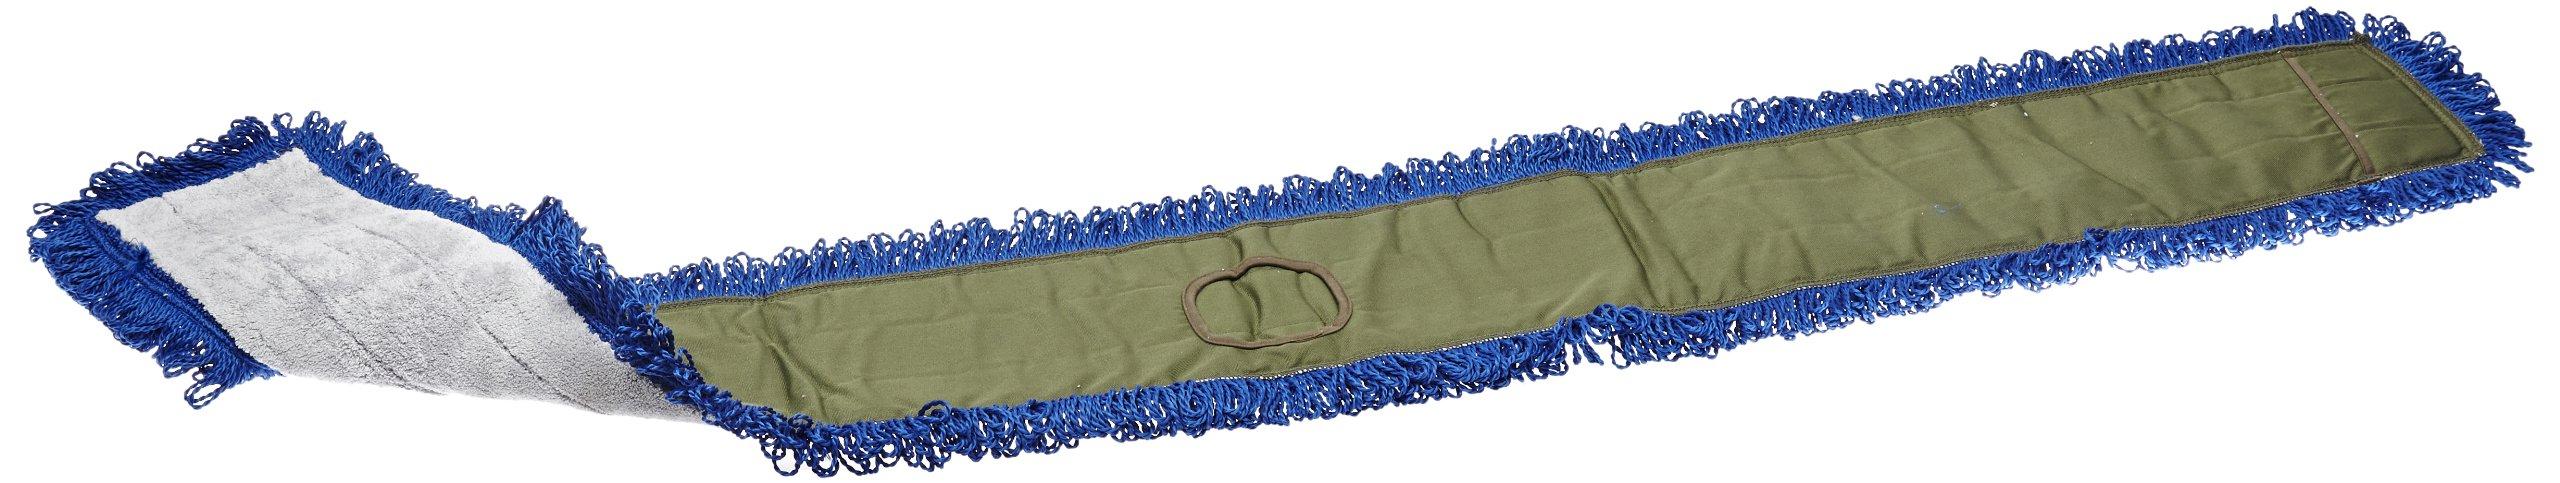 Impact LFCB72 Fringe Dry/Dust Mop Microfiber Pad, Canvas Back, 72'' Length, Gray/Gray (2 Bags of 12)